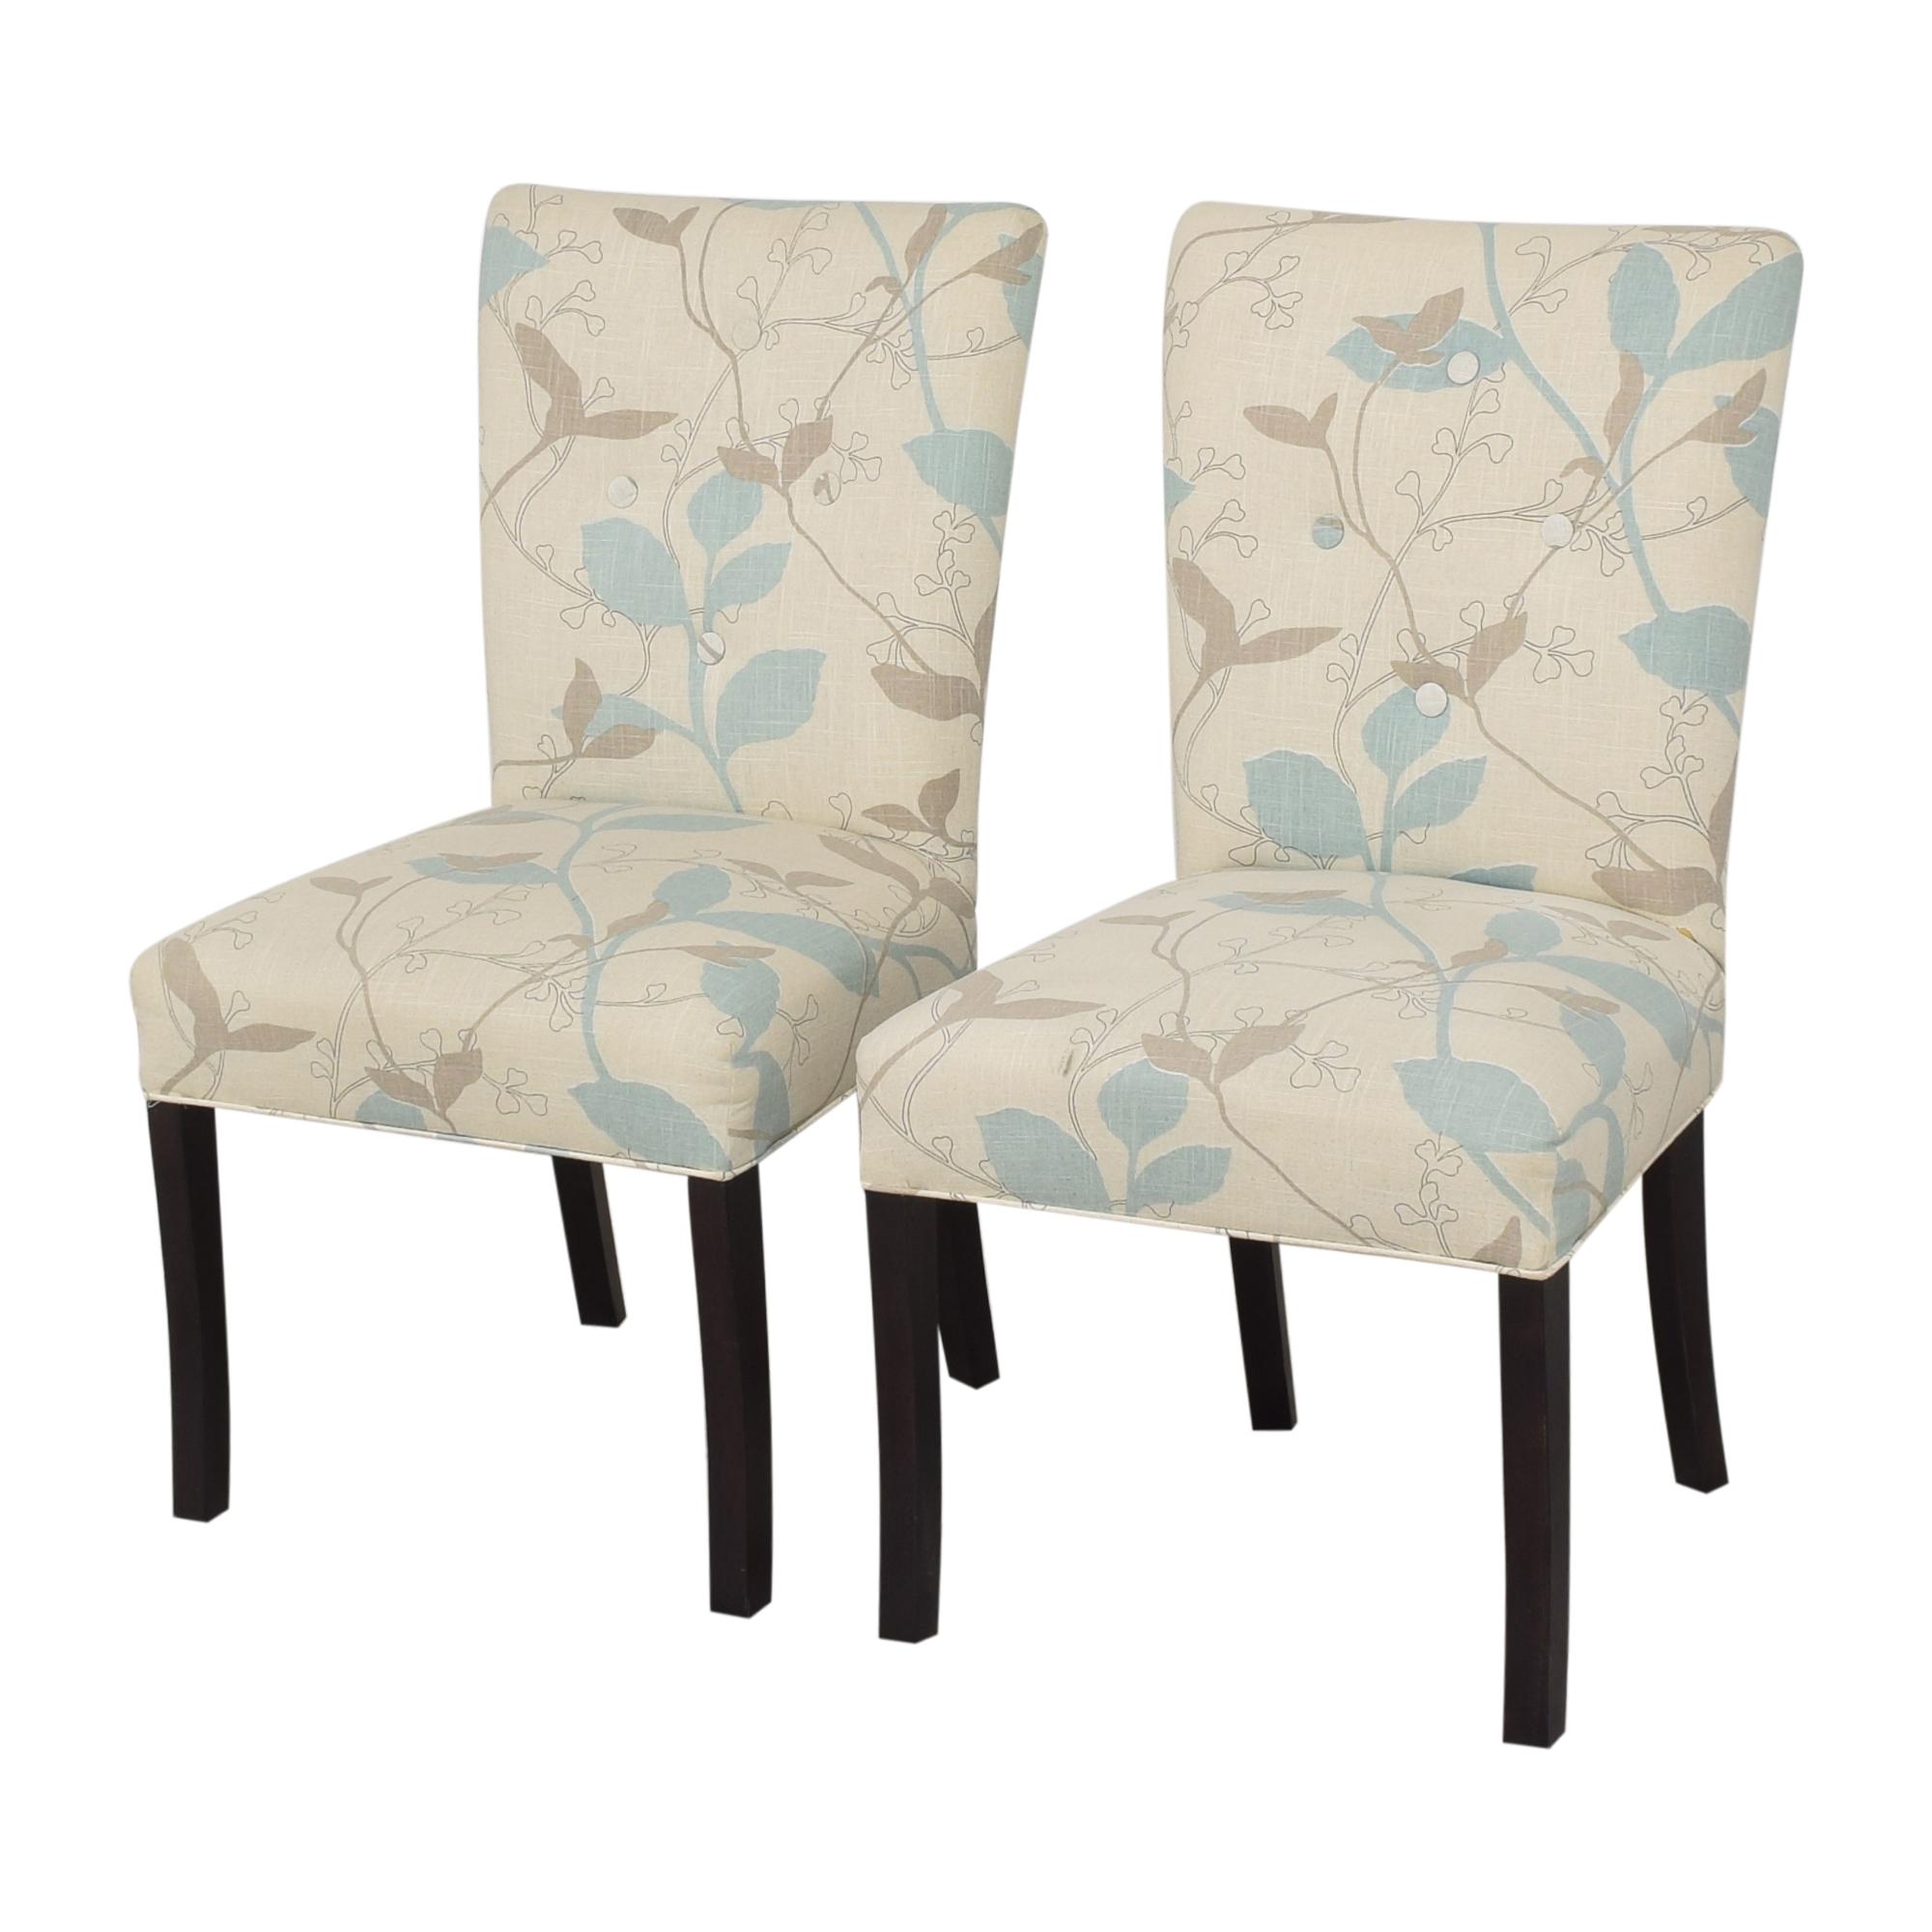 Wayfair Wayfair Sole Designs Upholstered Dining Chairs